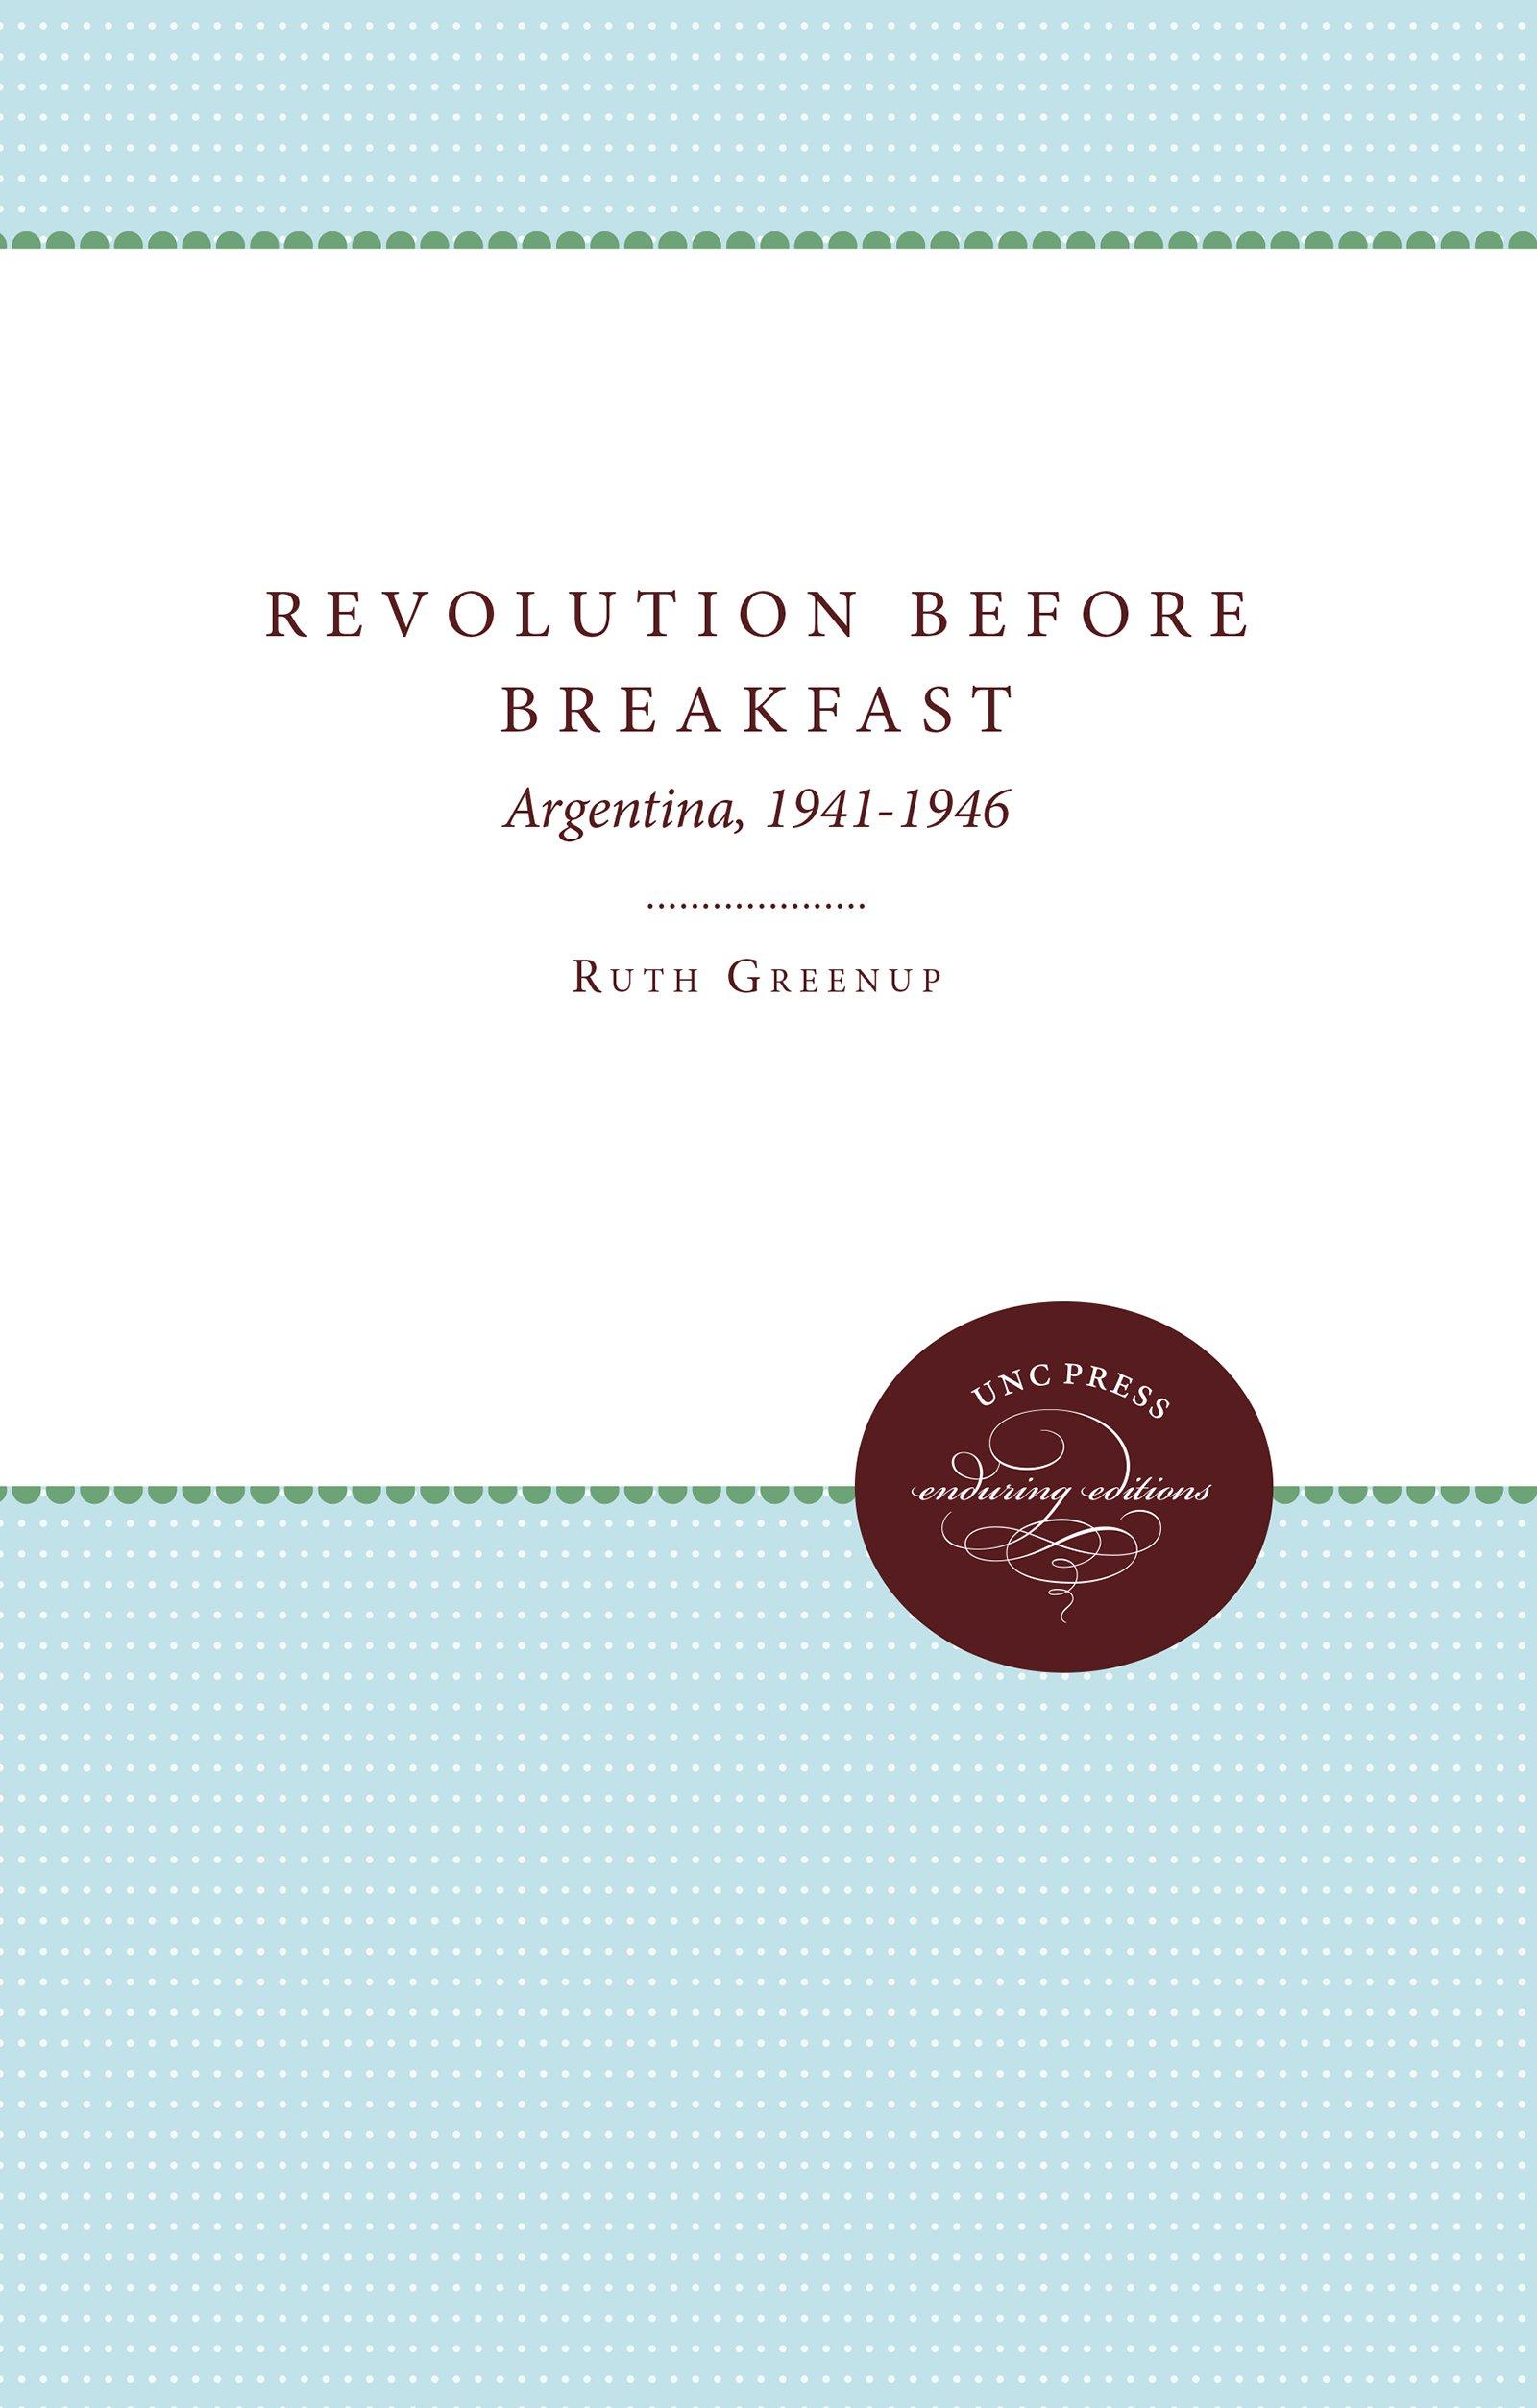 Revolution Before Breakfast: Argentina, 1941-1946 (Enduring Editions) pdf epub